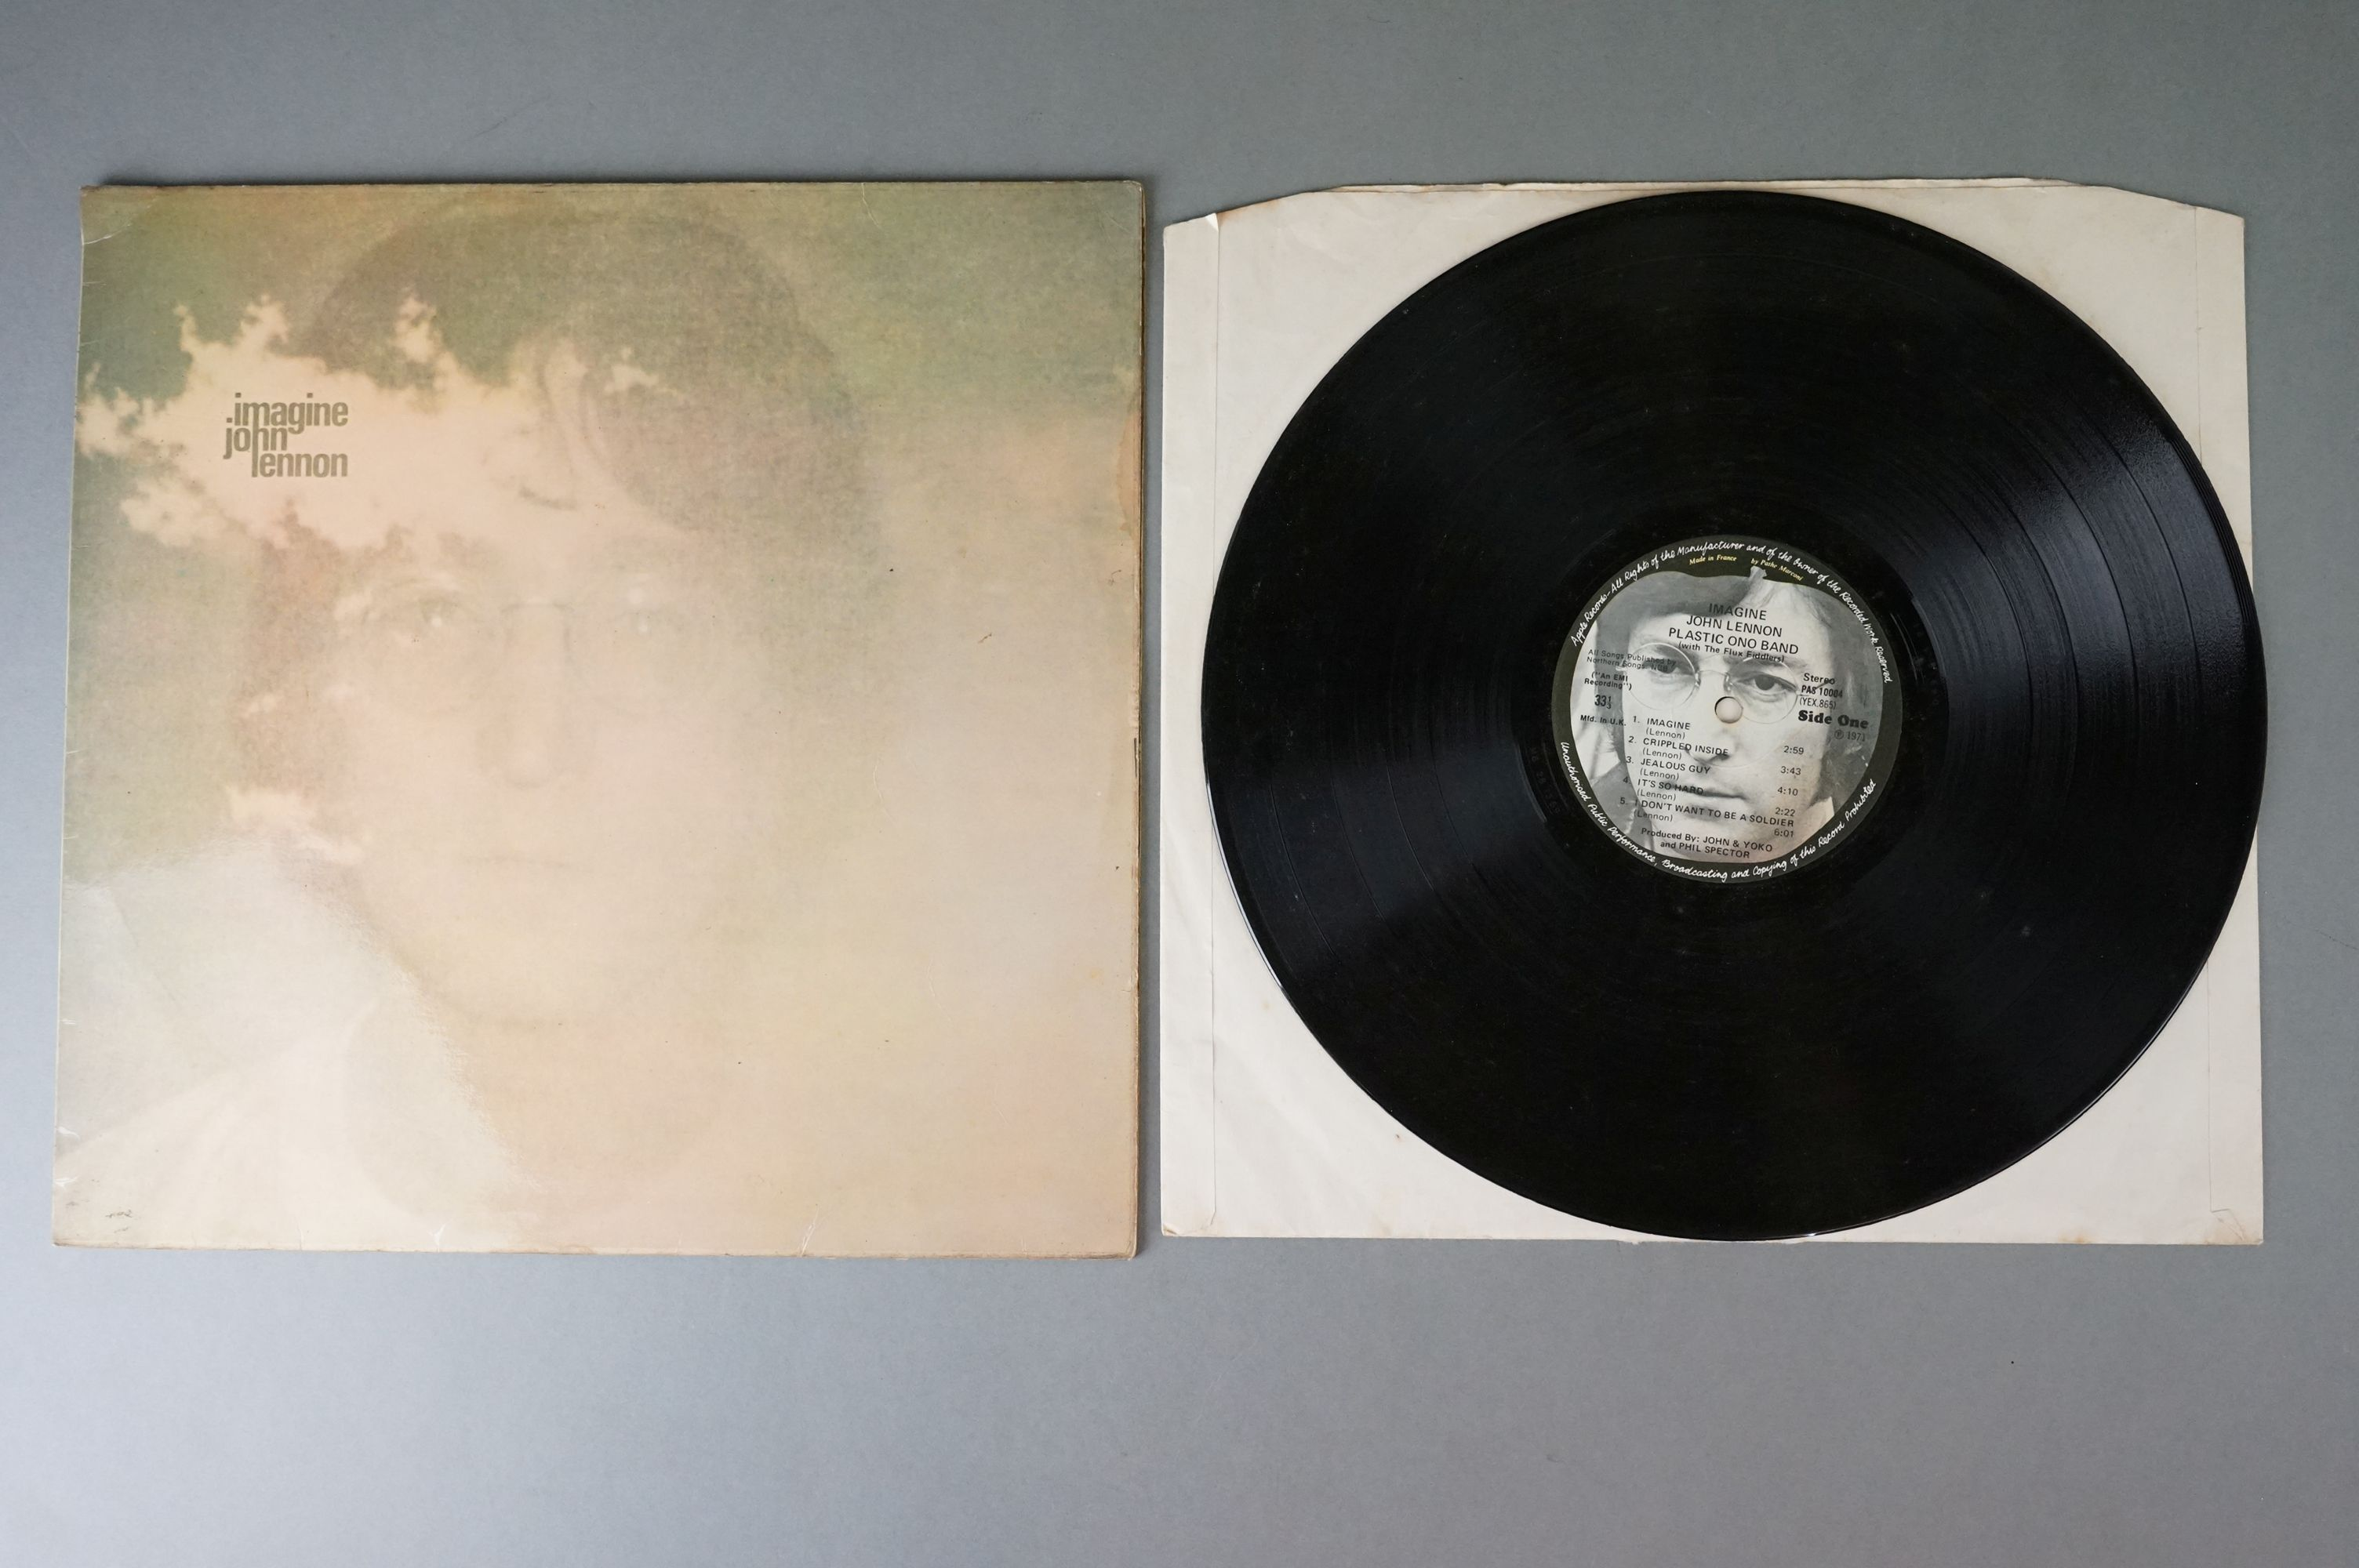 Vinyl - The Beatles & John Lennon 3 LP's to include Let It Be (PCS 7096) Stereo, incorrect inner, - Image 4 of 8